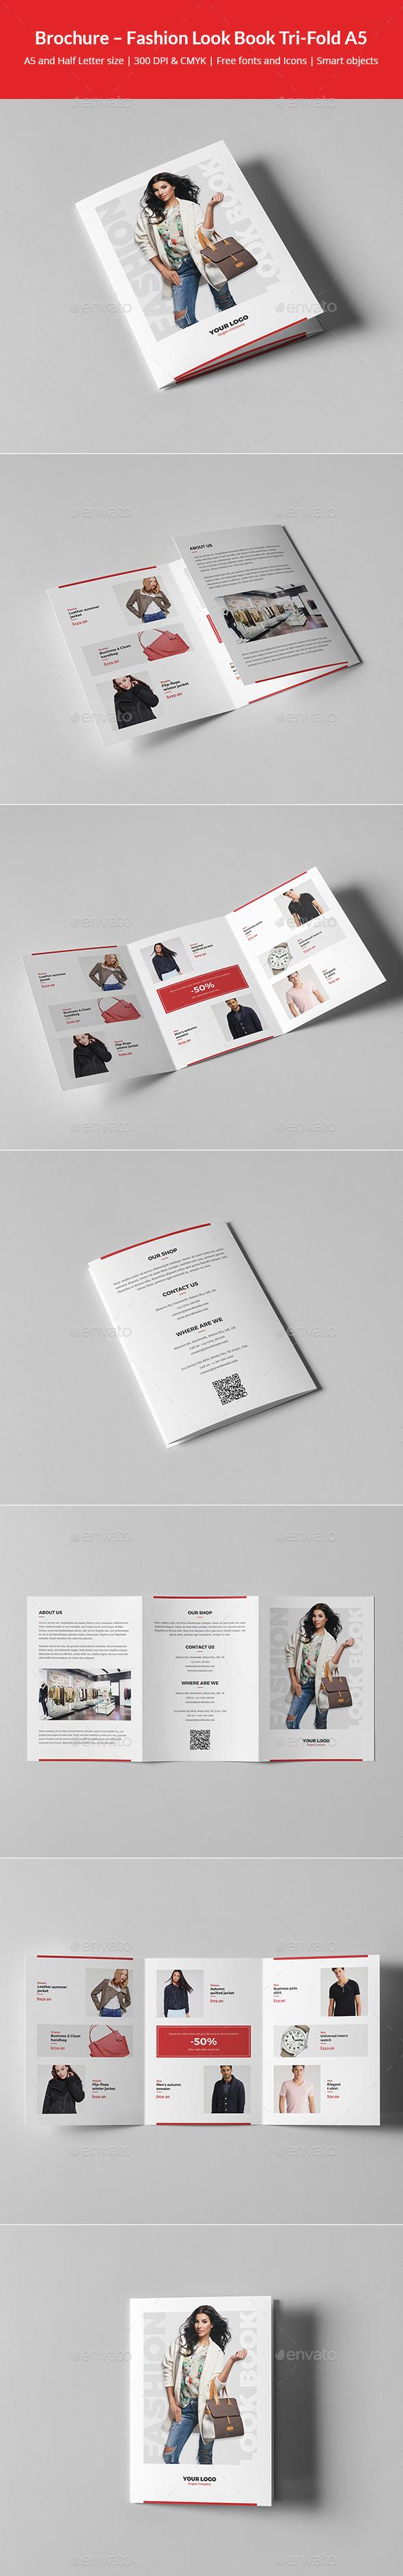 Brochure – Fashion Look Book Tri-Fold A5 - Informational Brochures